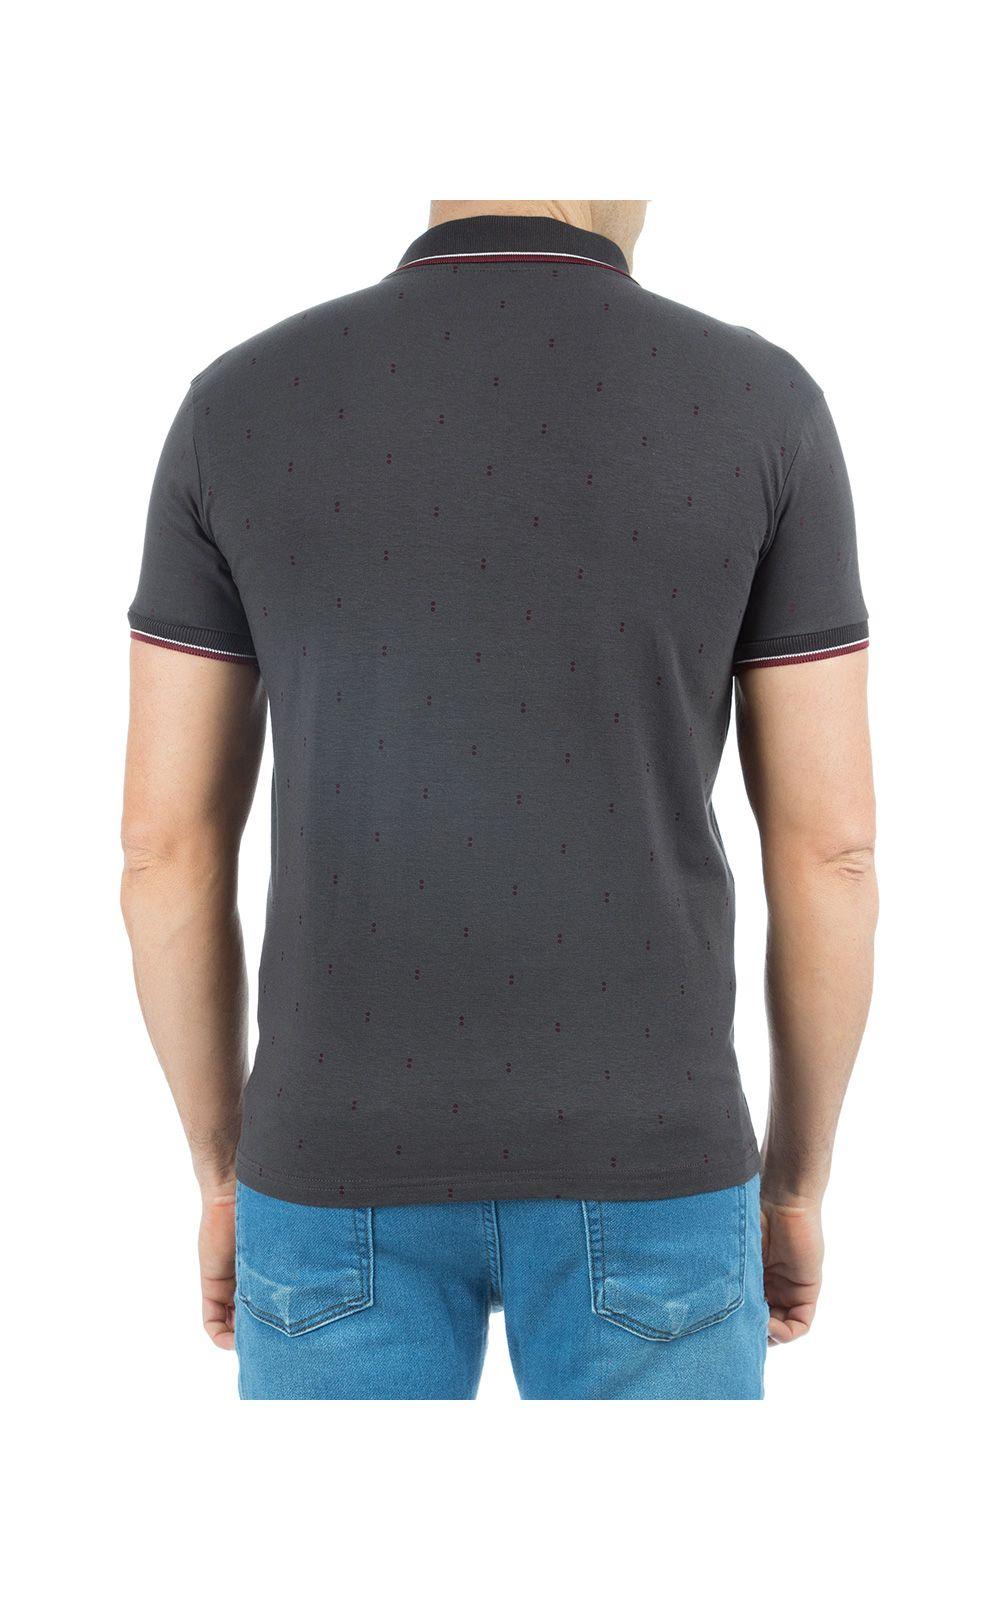 Foto 2 - Camisa Polo Masculina Cinza Escuro Estampada